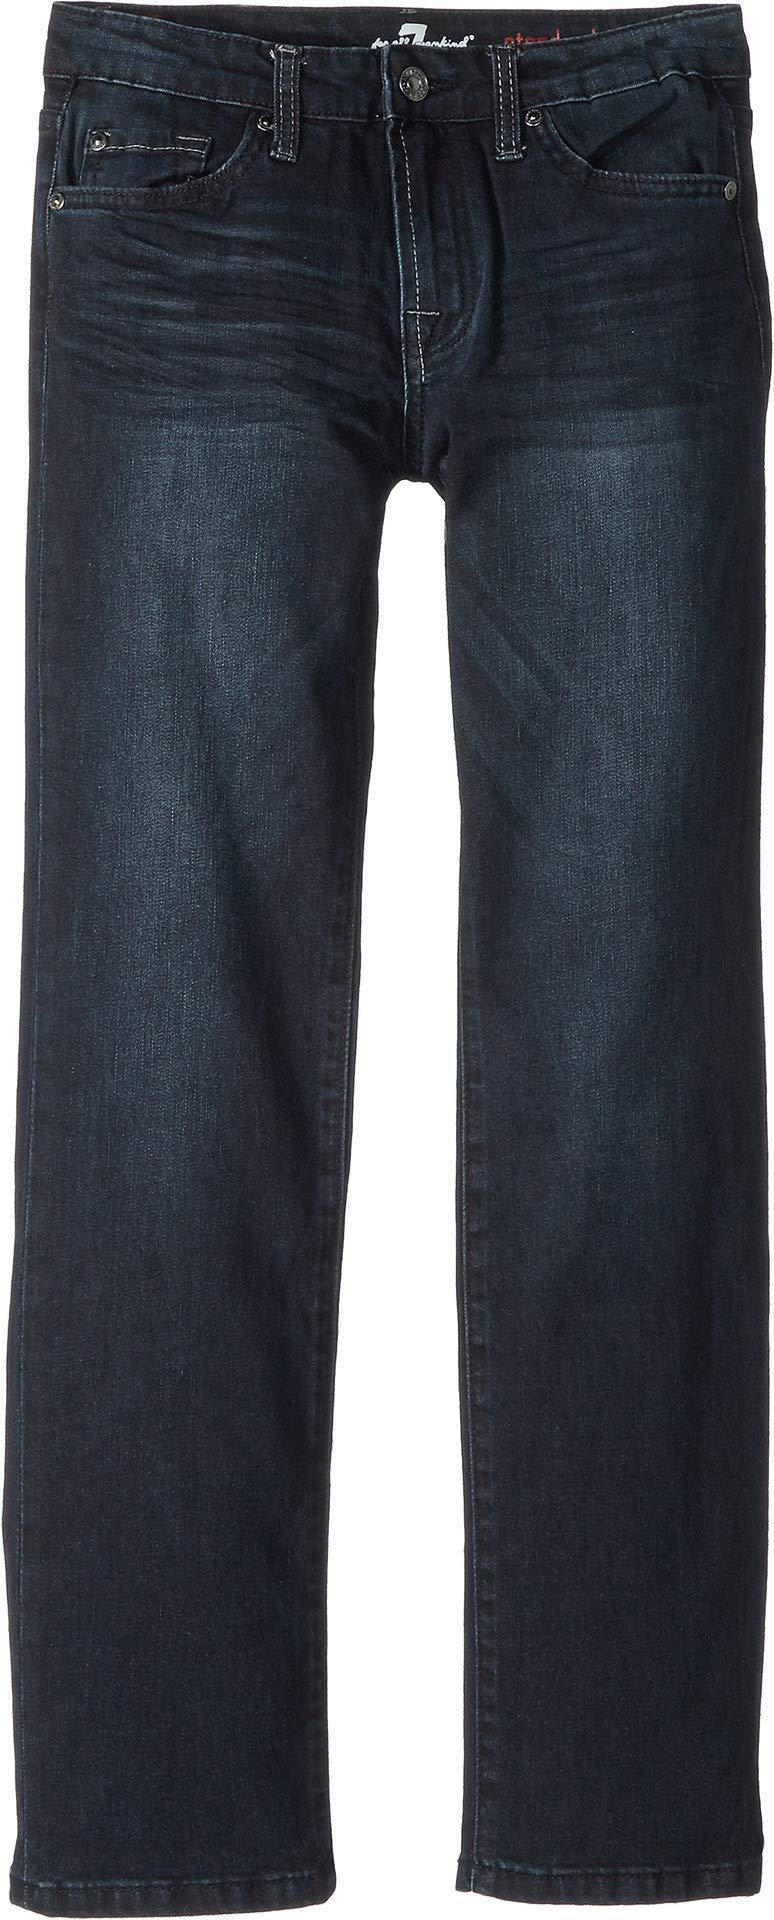 7 For All Mankind Kids Boy's Standard Stretch Denim Jeans in Dynamic (Big Kids) Dynamic 16